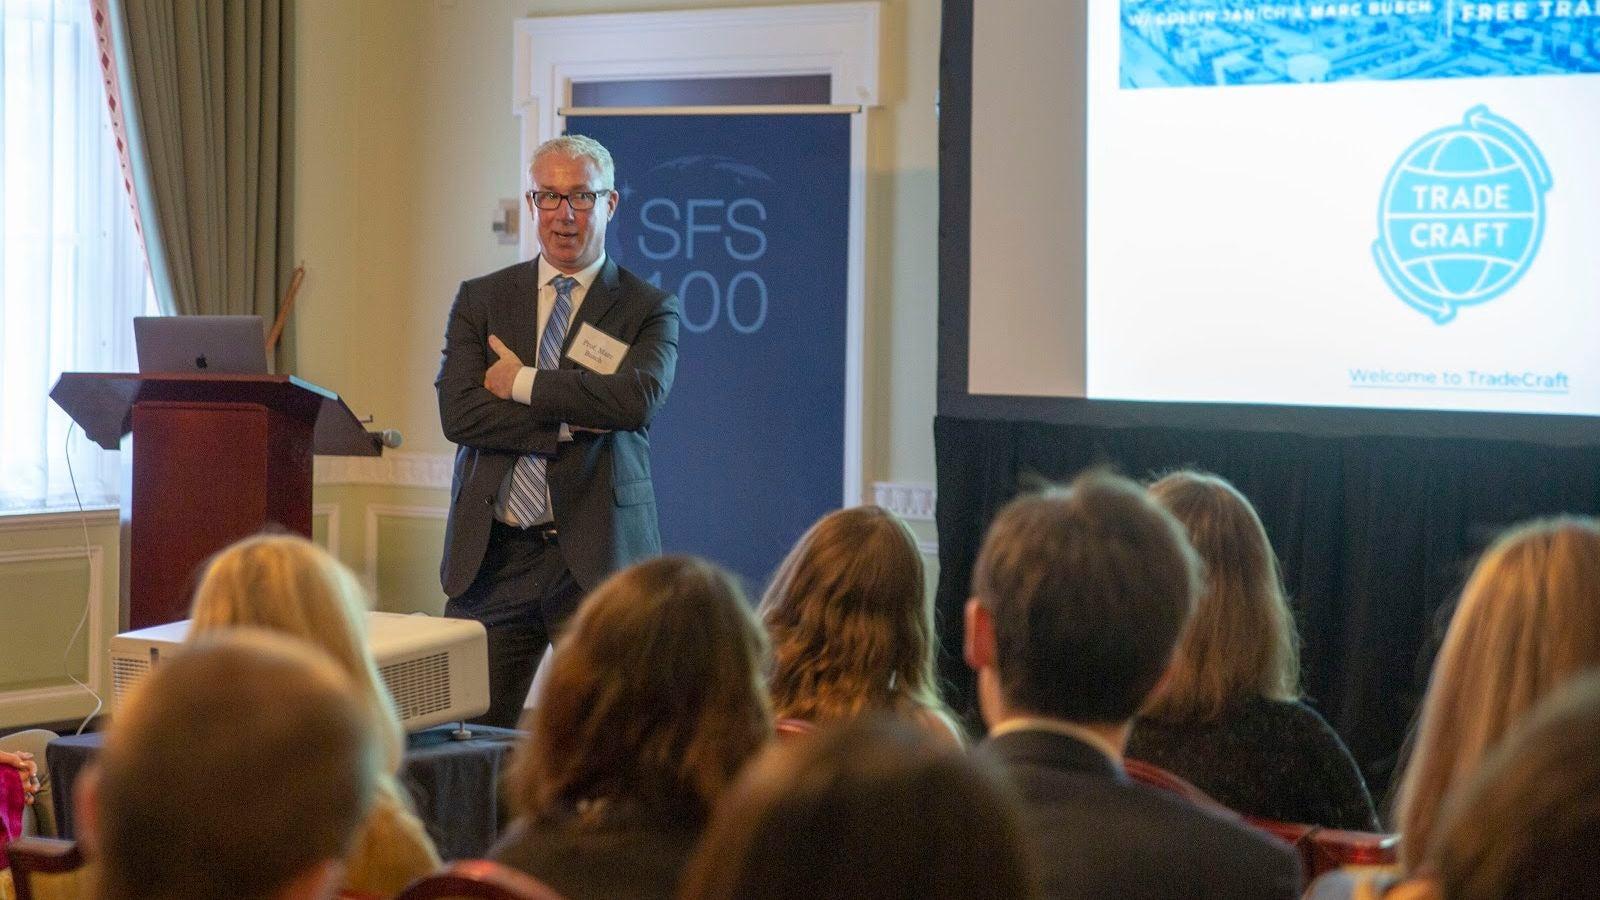 Professor Marc Busch, the Karl F. Landegger Professor of International Business Diplomacy